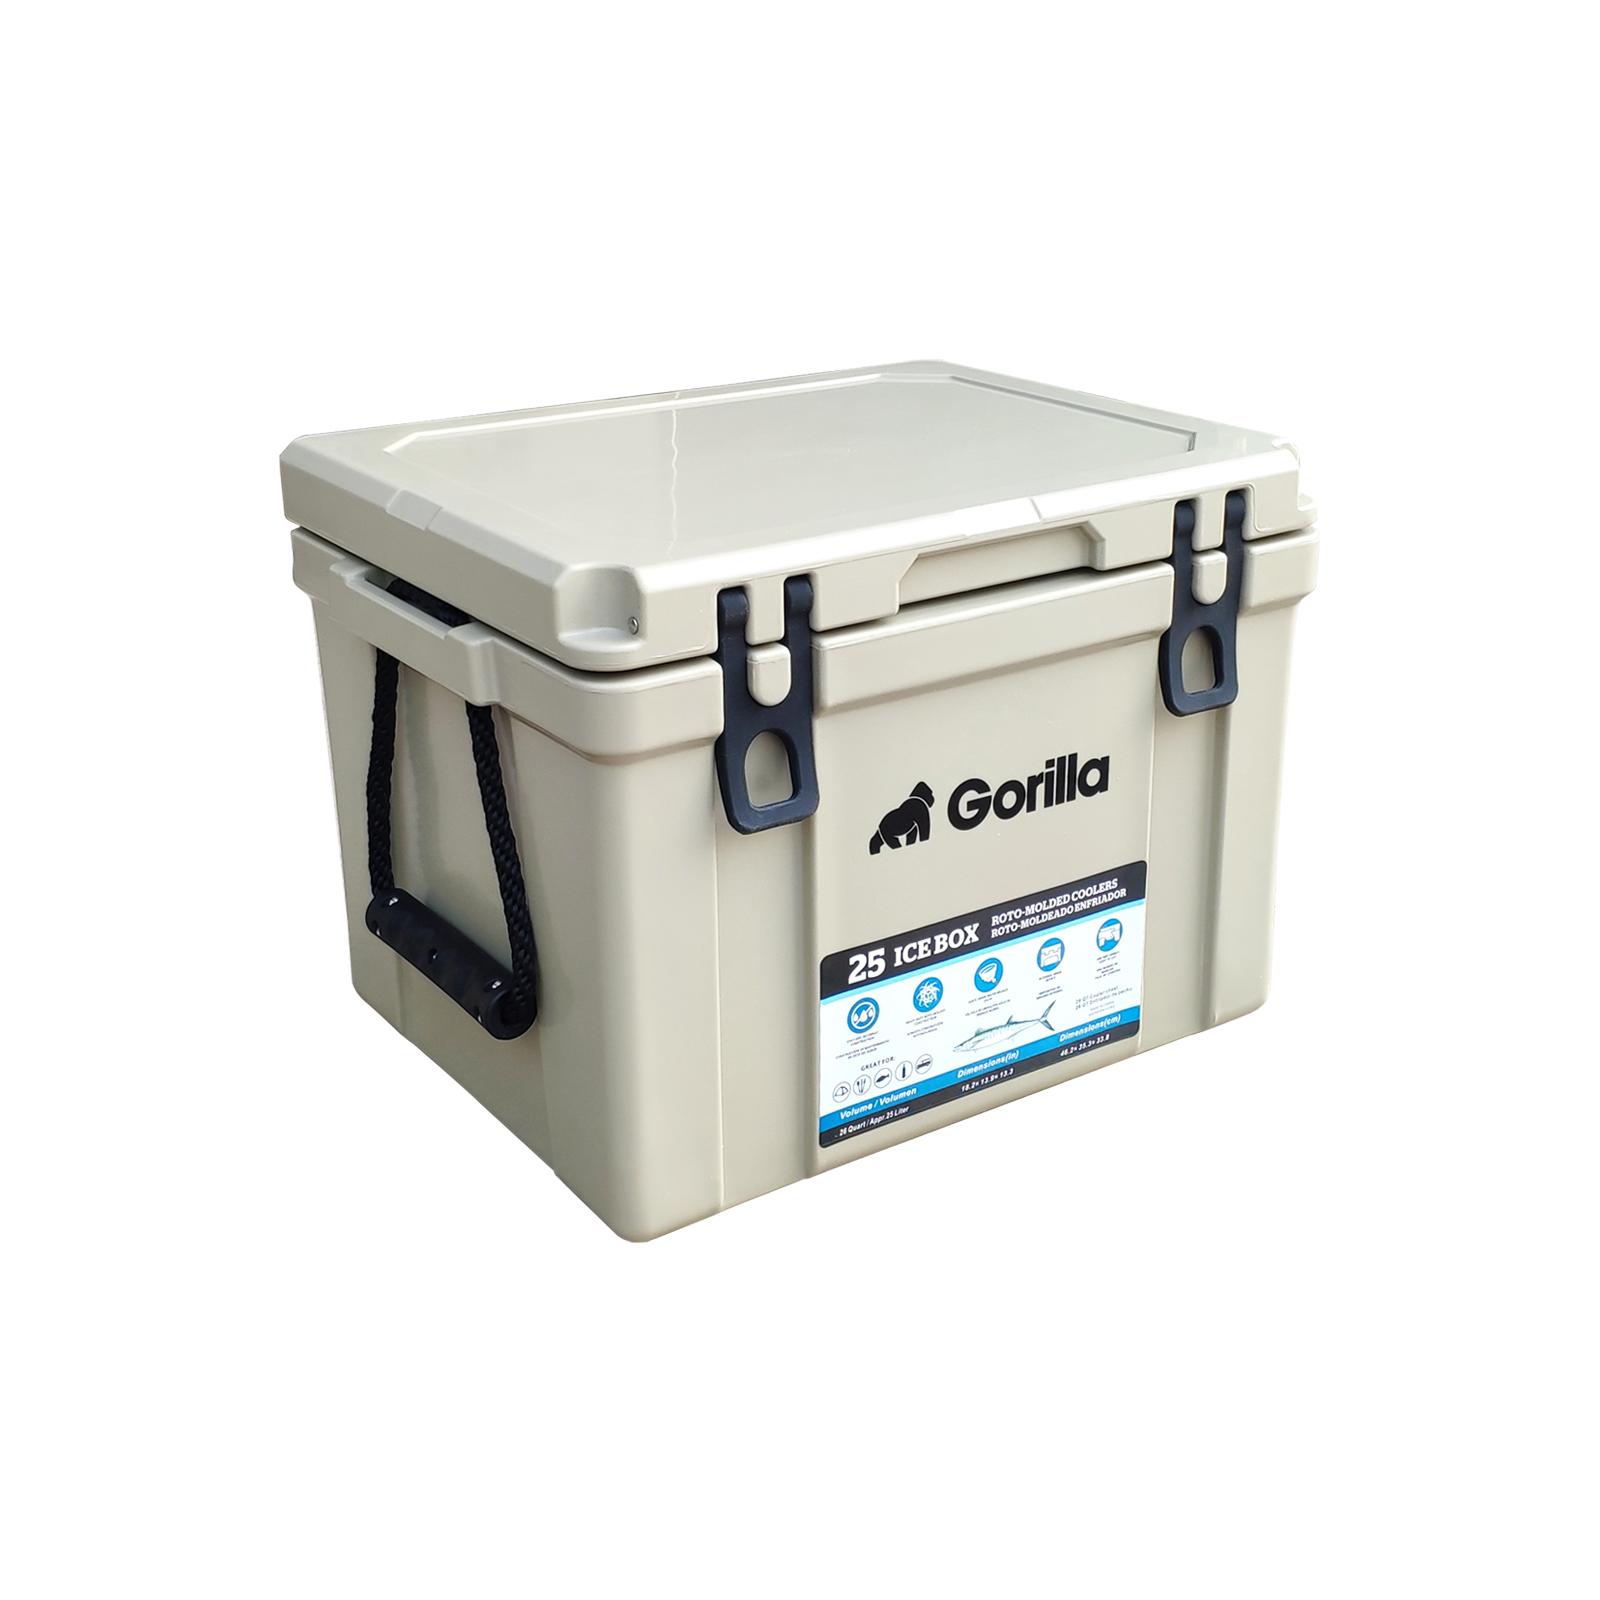 Gorilla: Heavy Duty Ice Box Chilly Bin 25L image